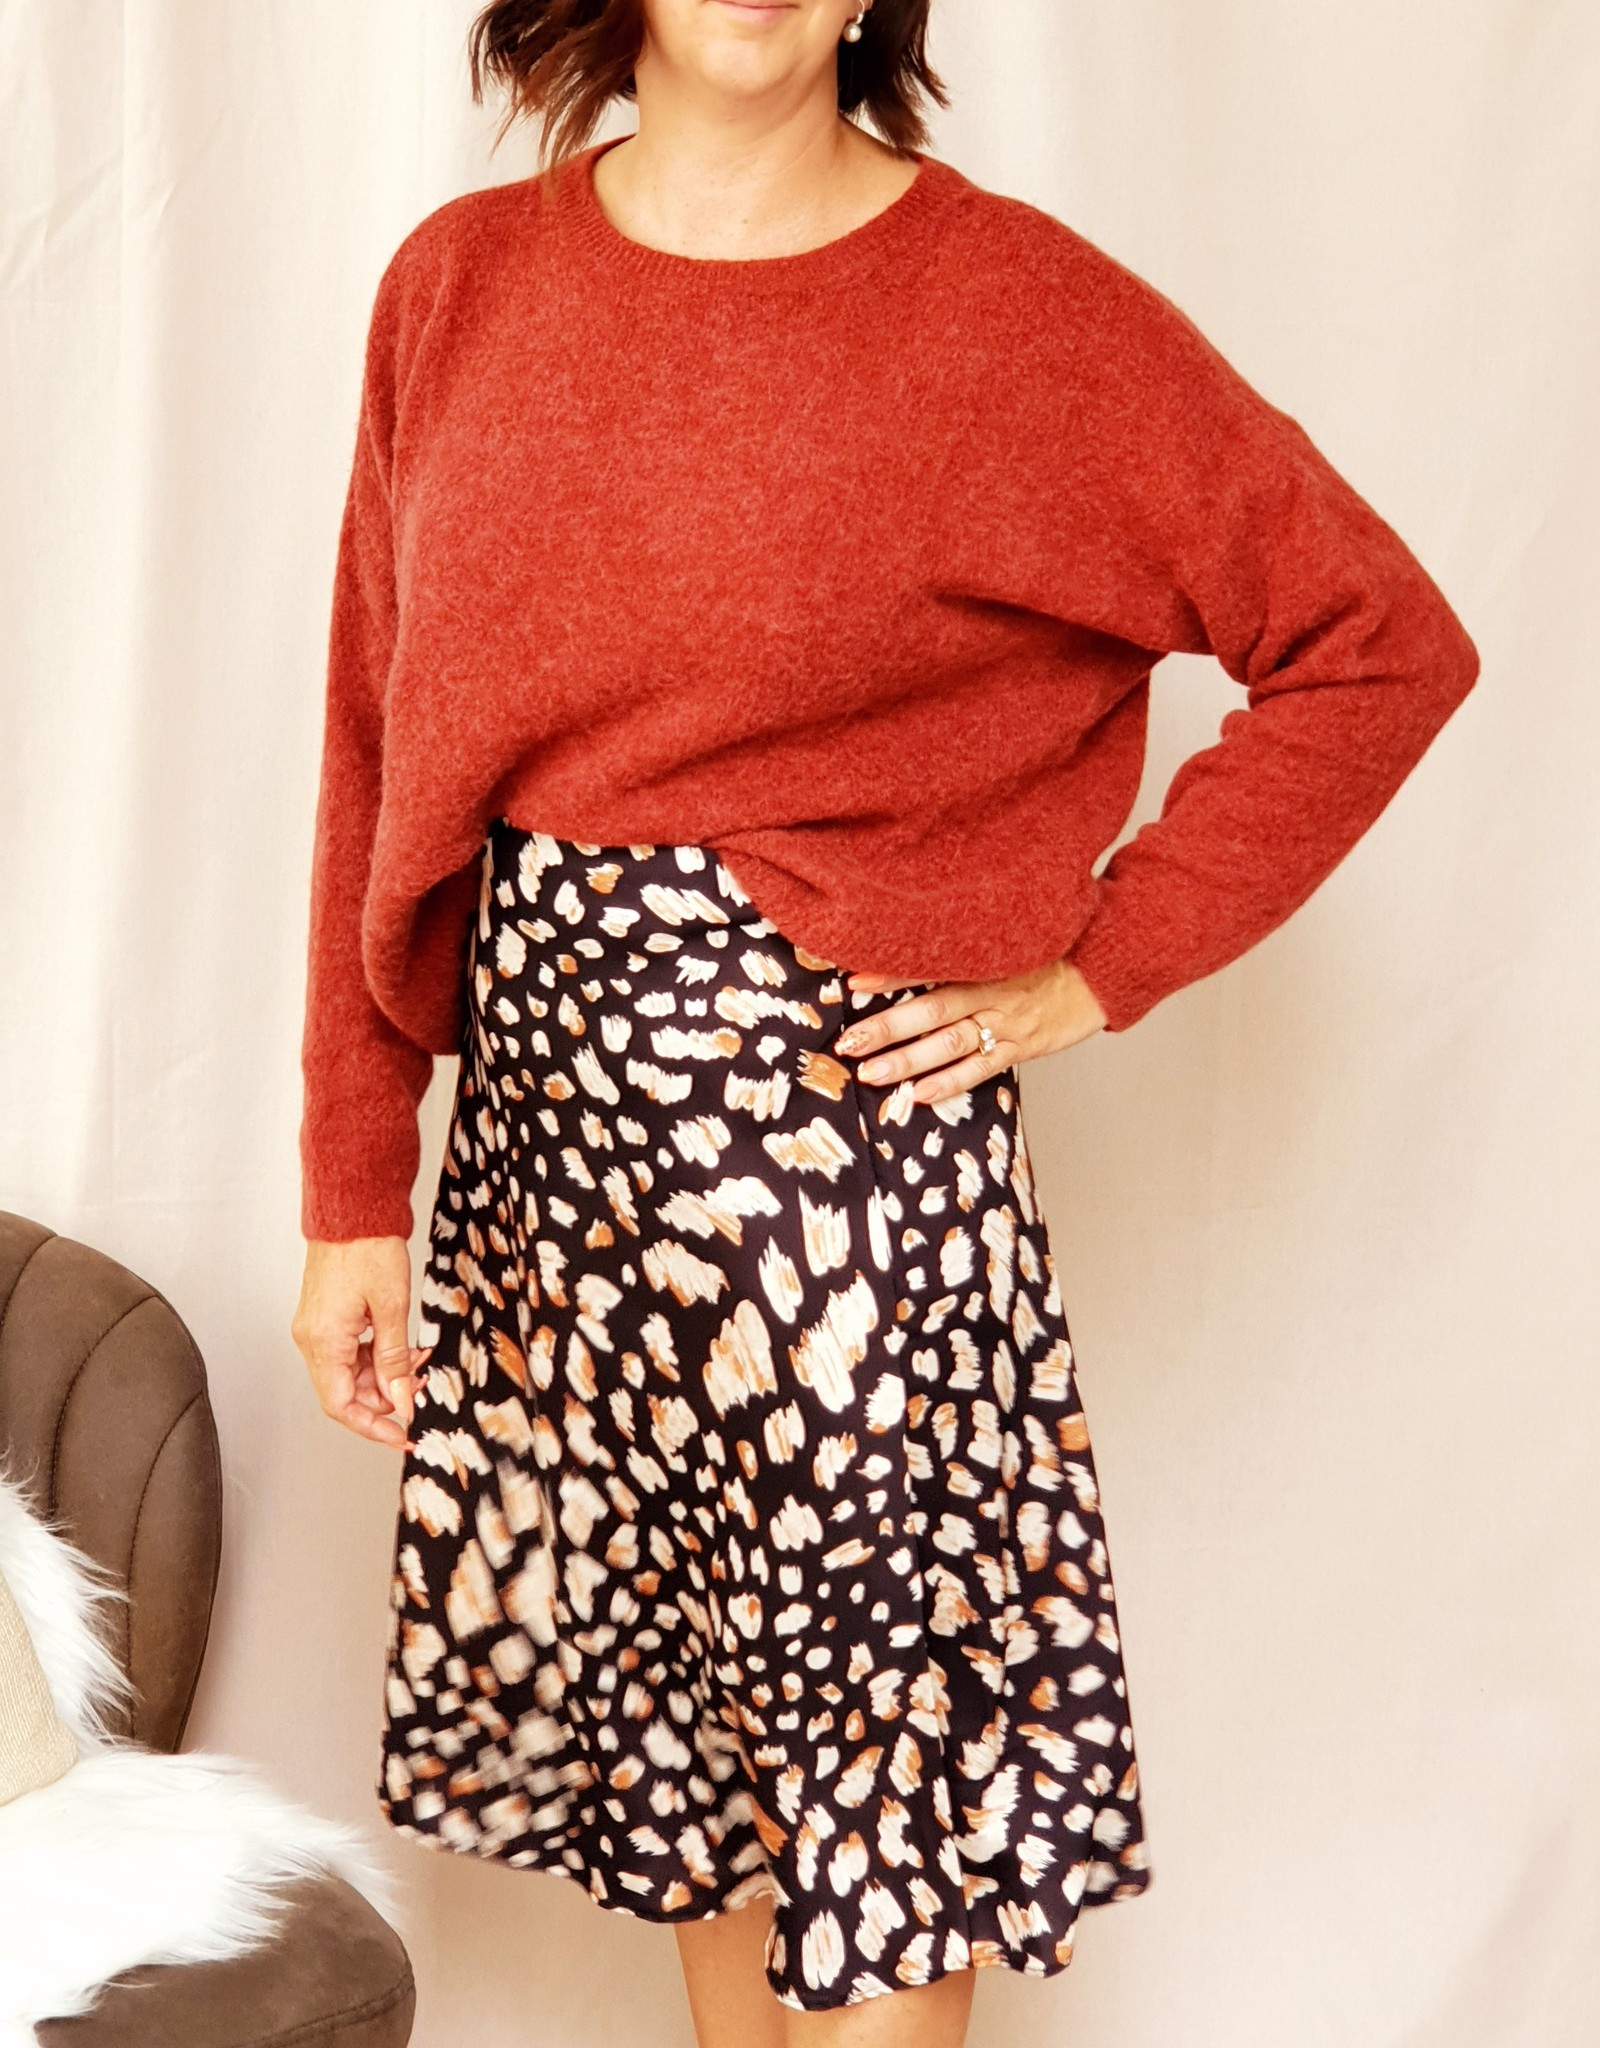 Mika Elles Dark brown red sweater